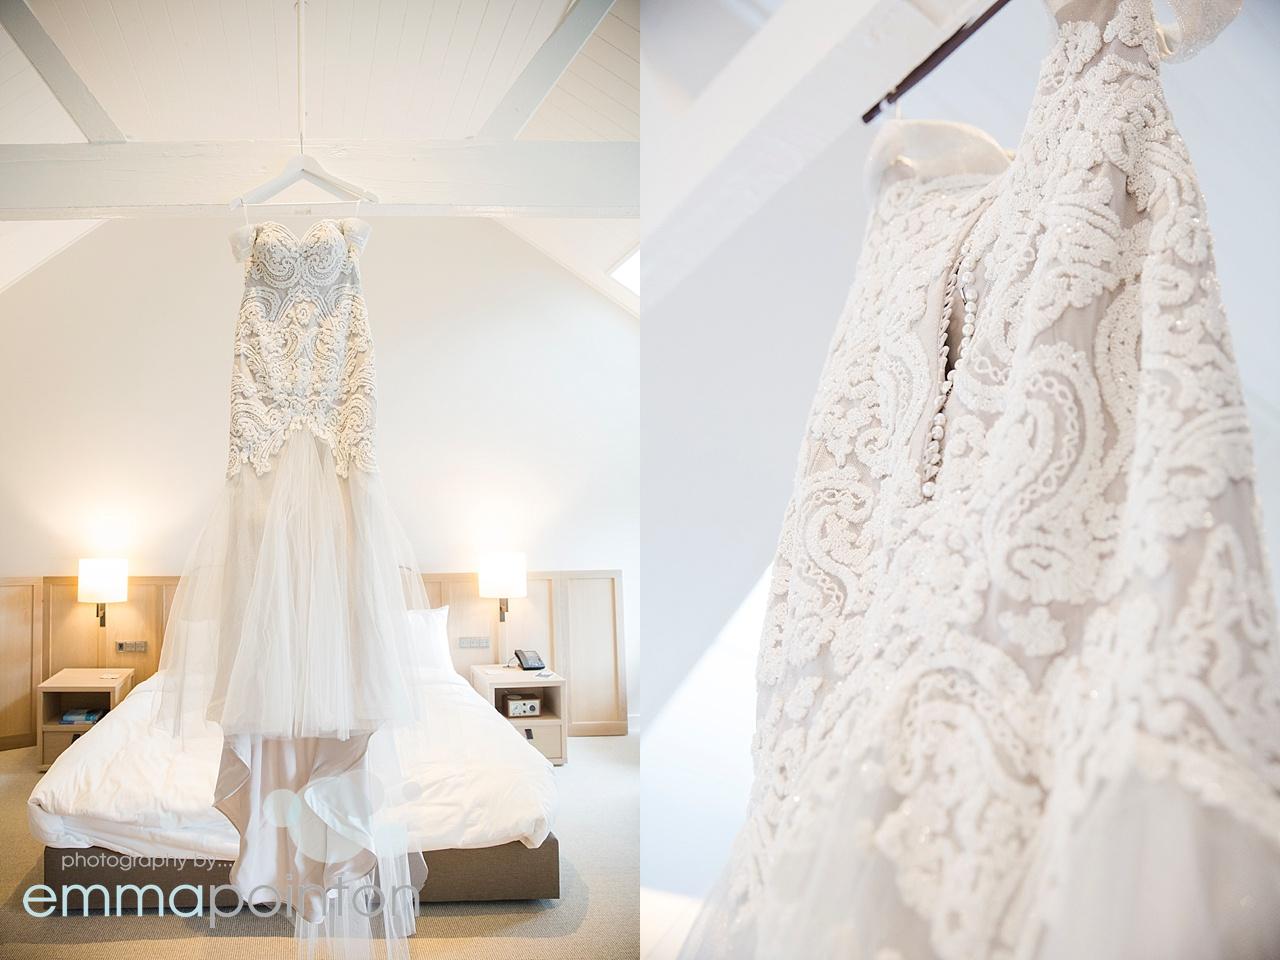 Loui Col Wedding Dress